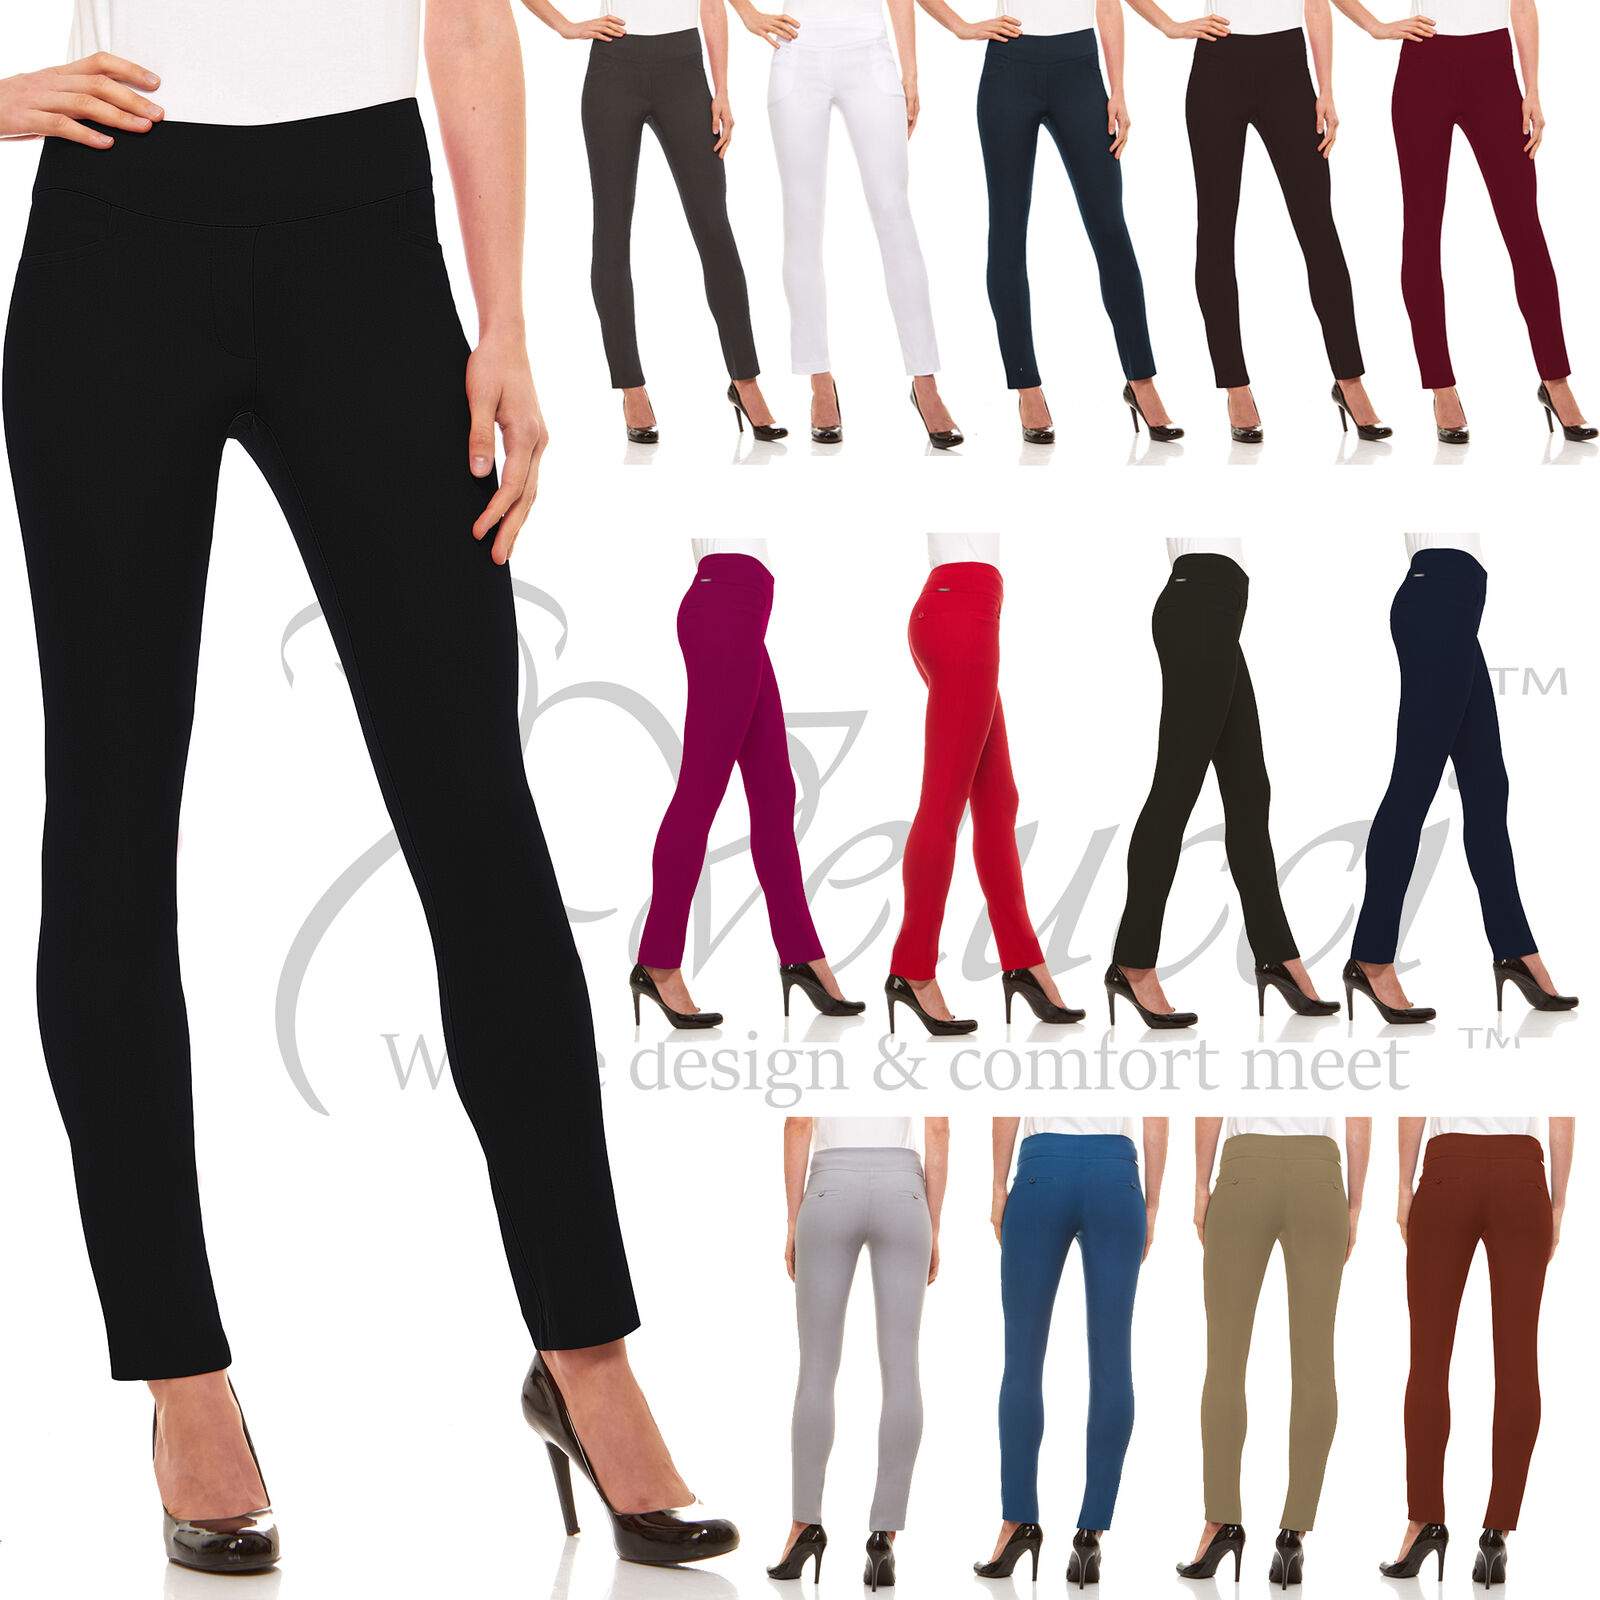 Womens Straight Leg Dress Pants - Stretch Slim Fit Pull On S